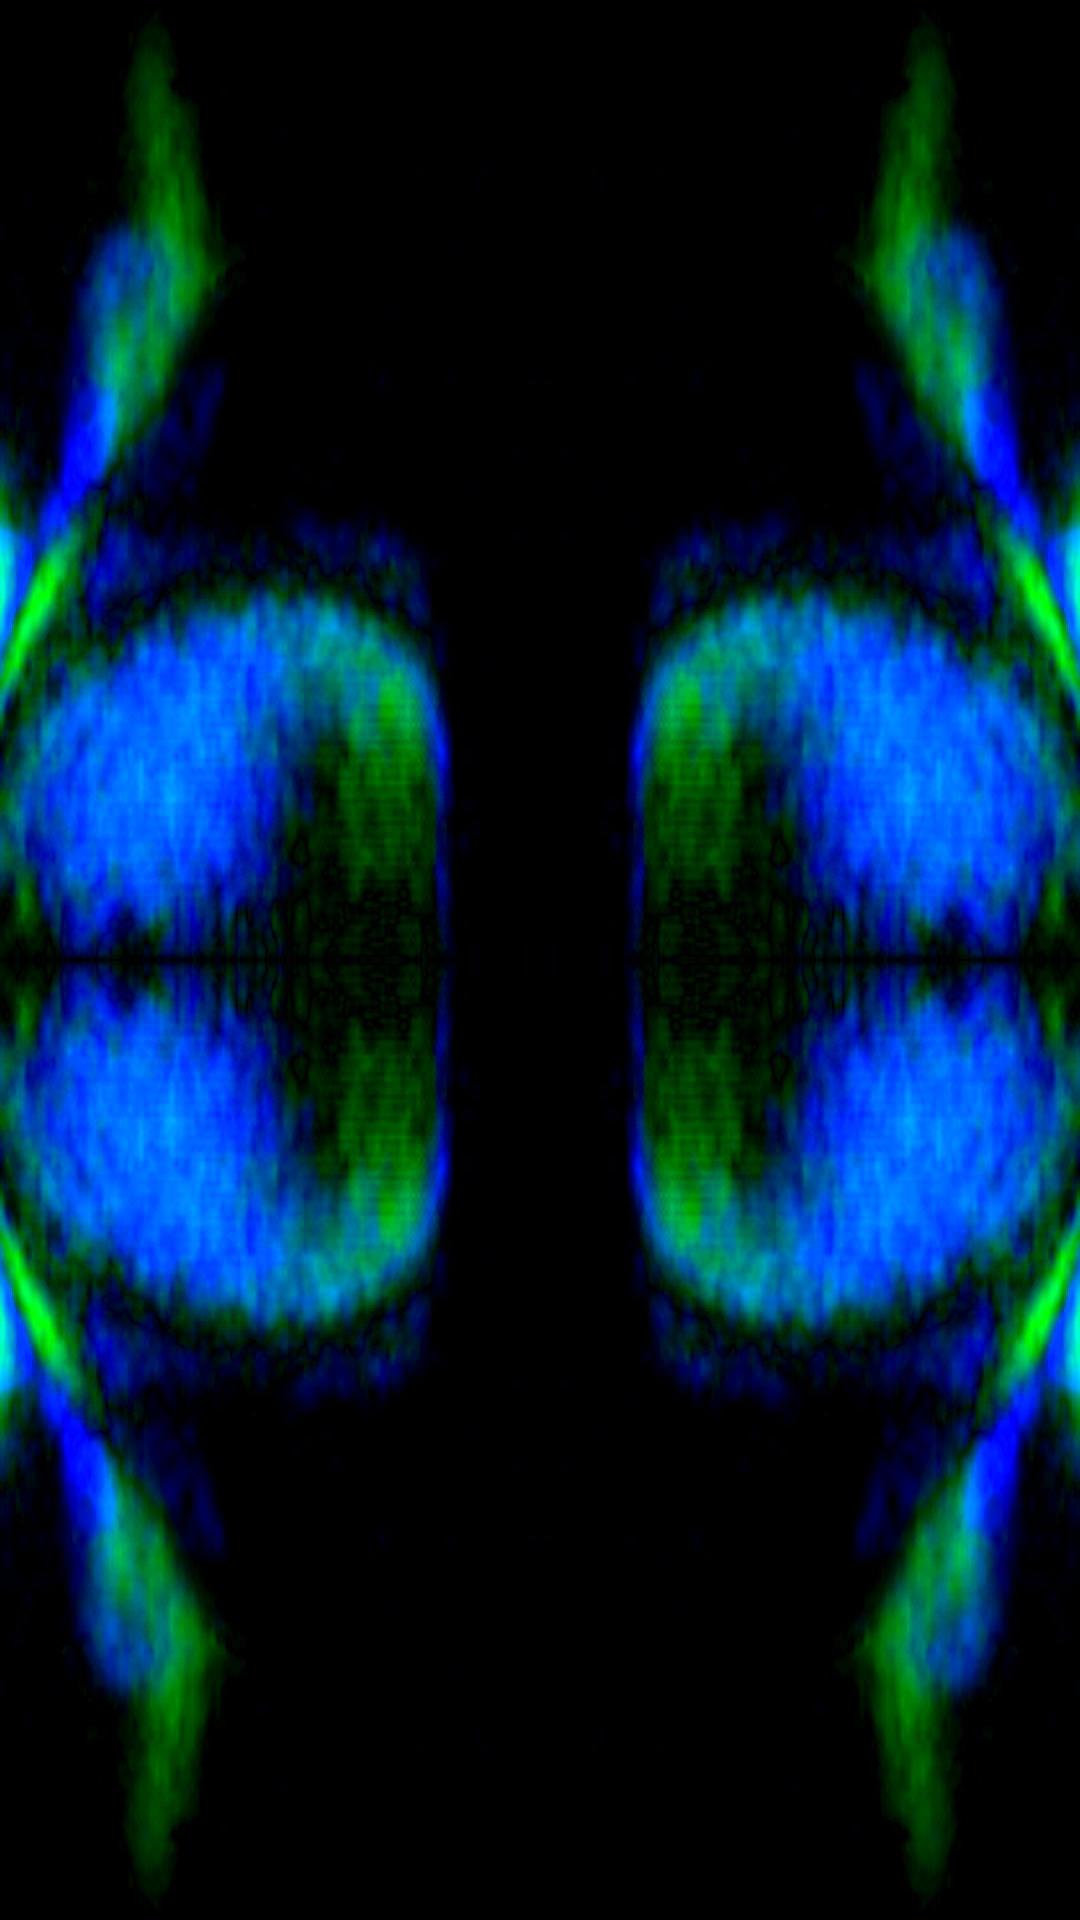 Lake - Central Blob 3